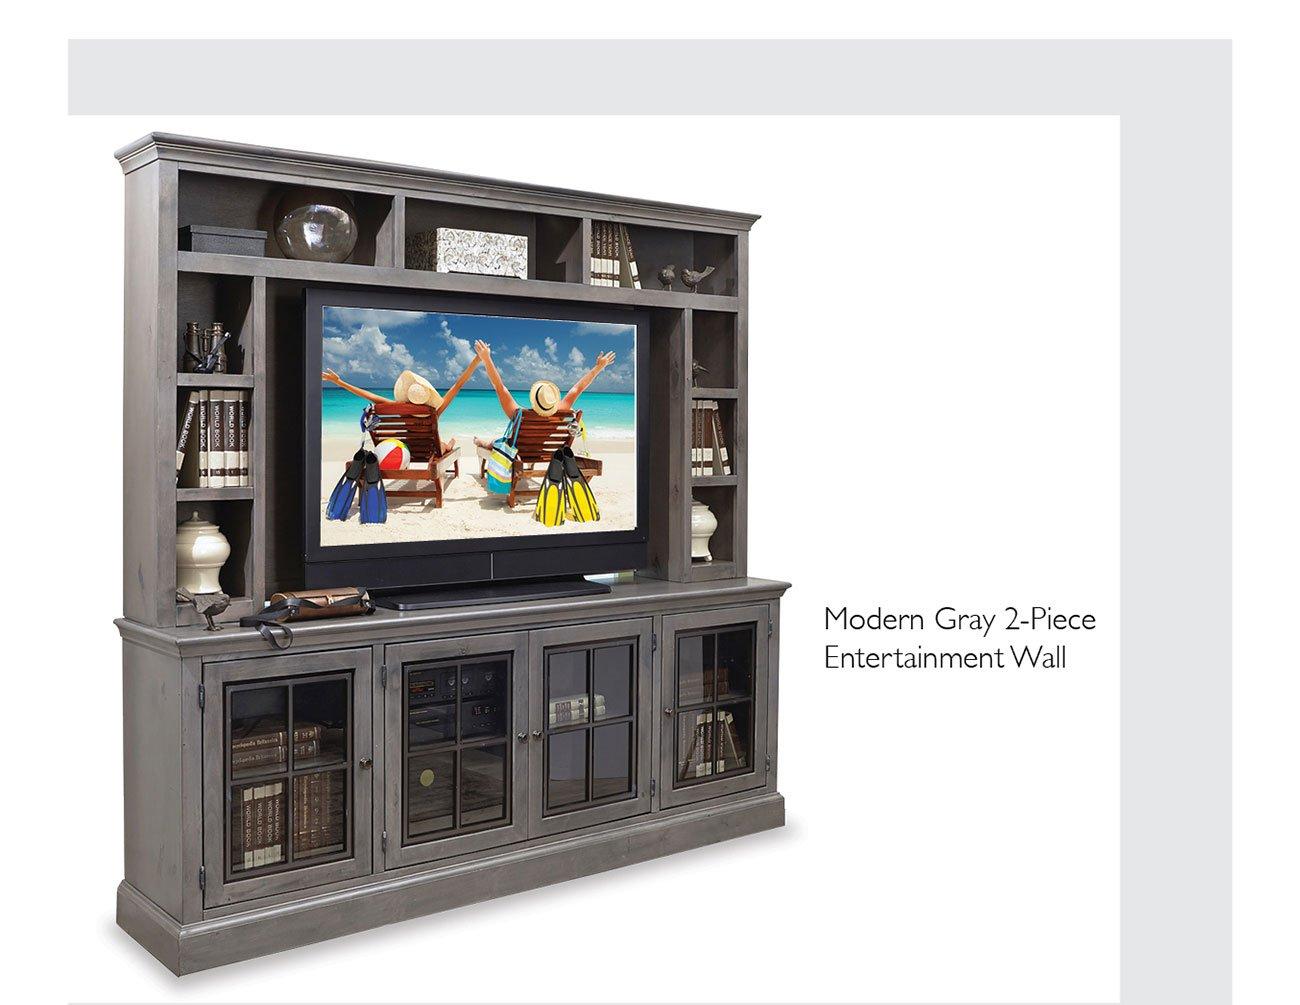 Modern-gray-entertainment-wall